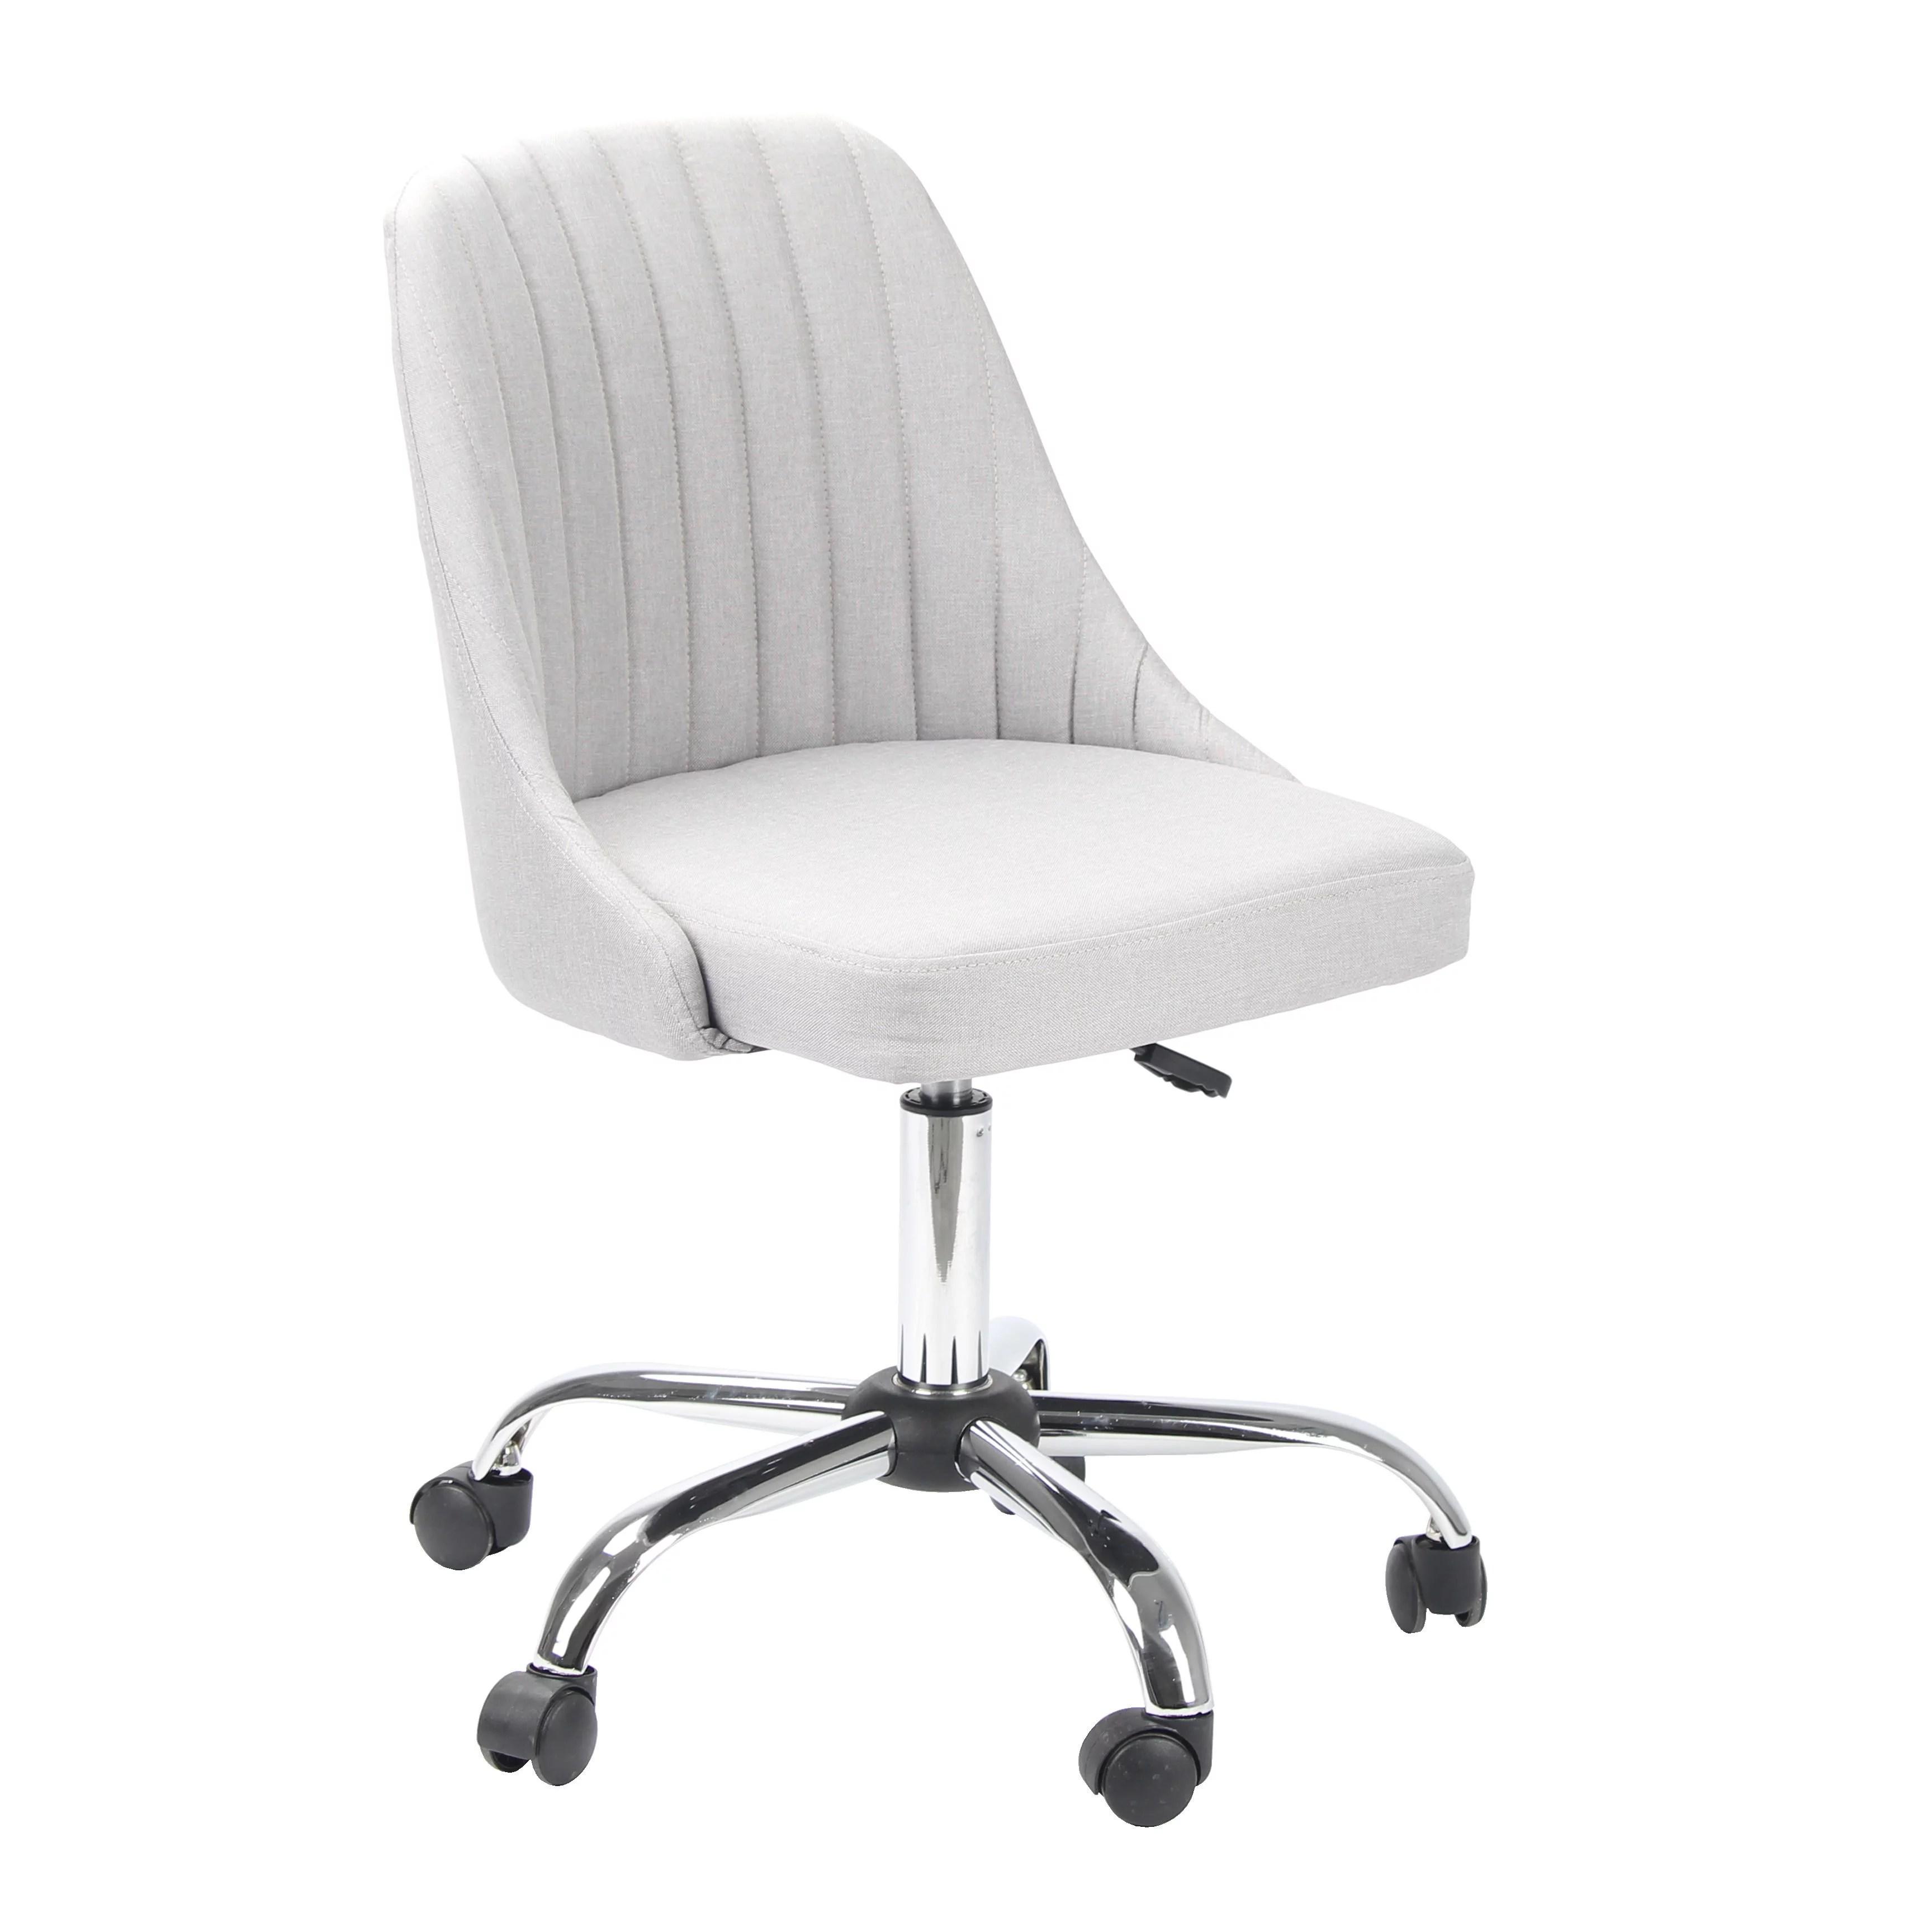 comfortable home office chair walmart black porthos designer chairs with wheels stylish fabric upholstery premium quality comfort ergonomic lumbar support